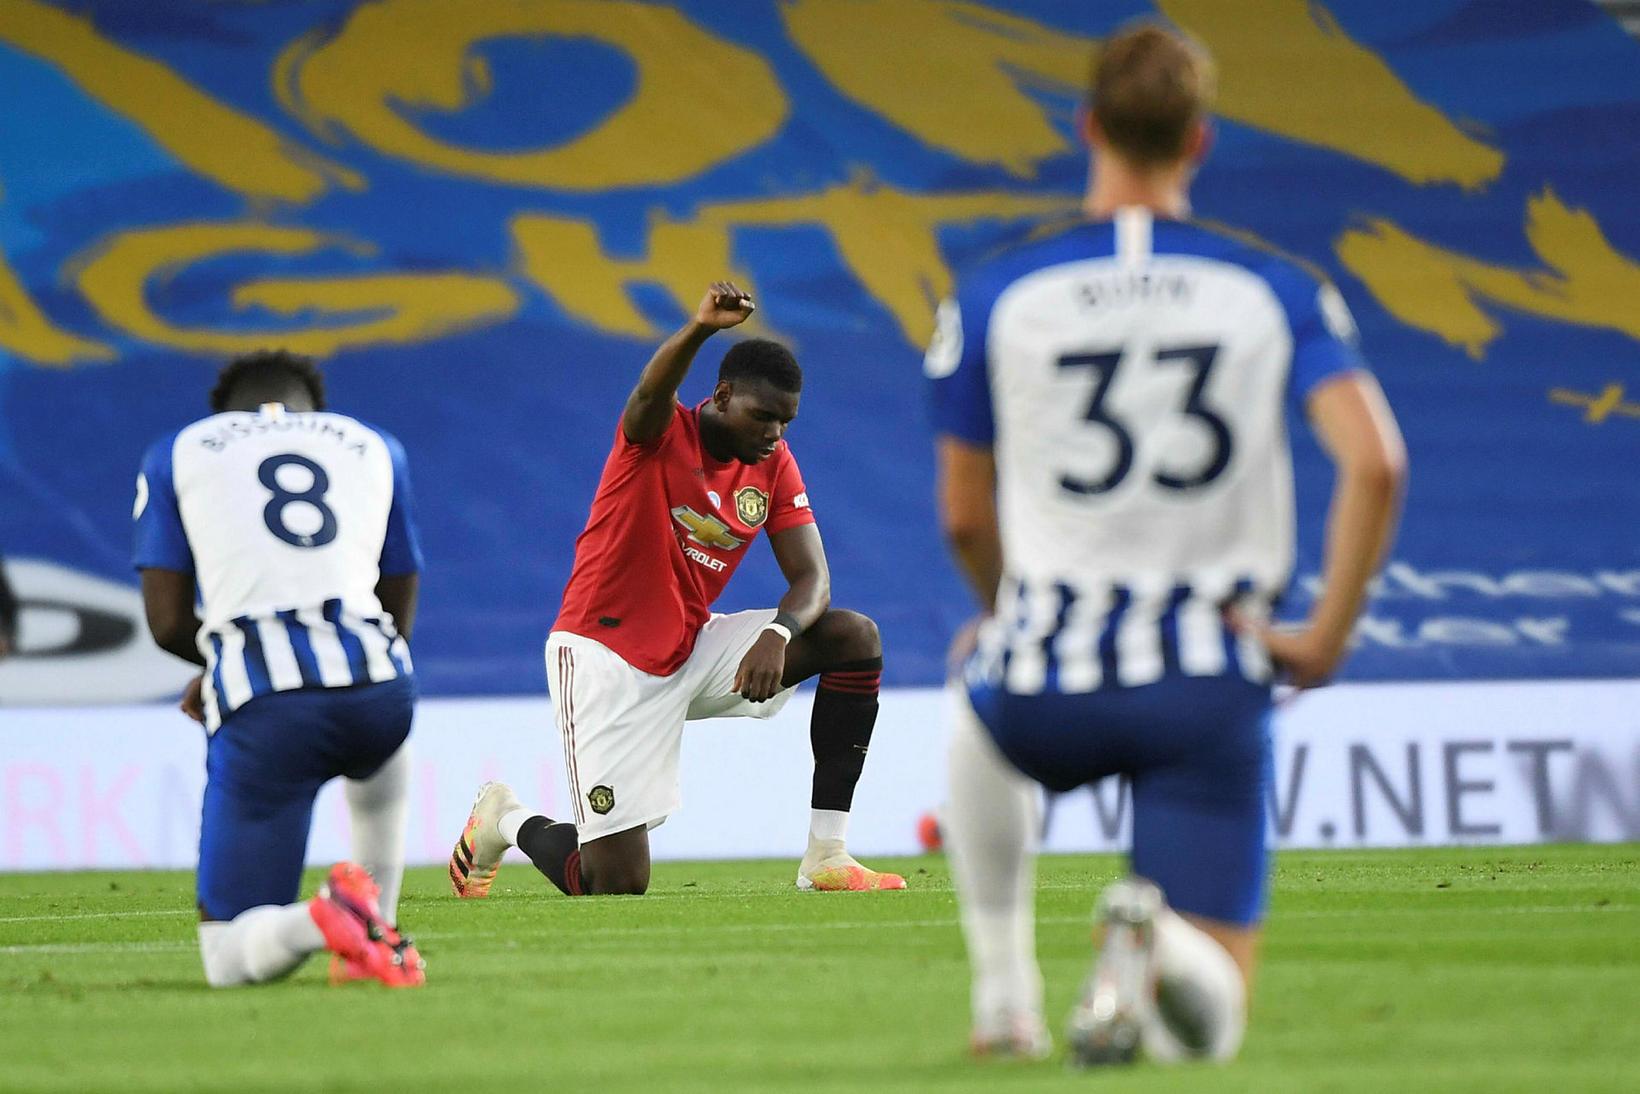 Paul Pogba krýpur á kné í leik Manchester United og …